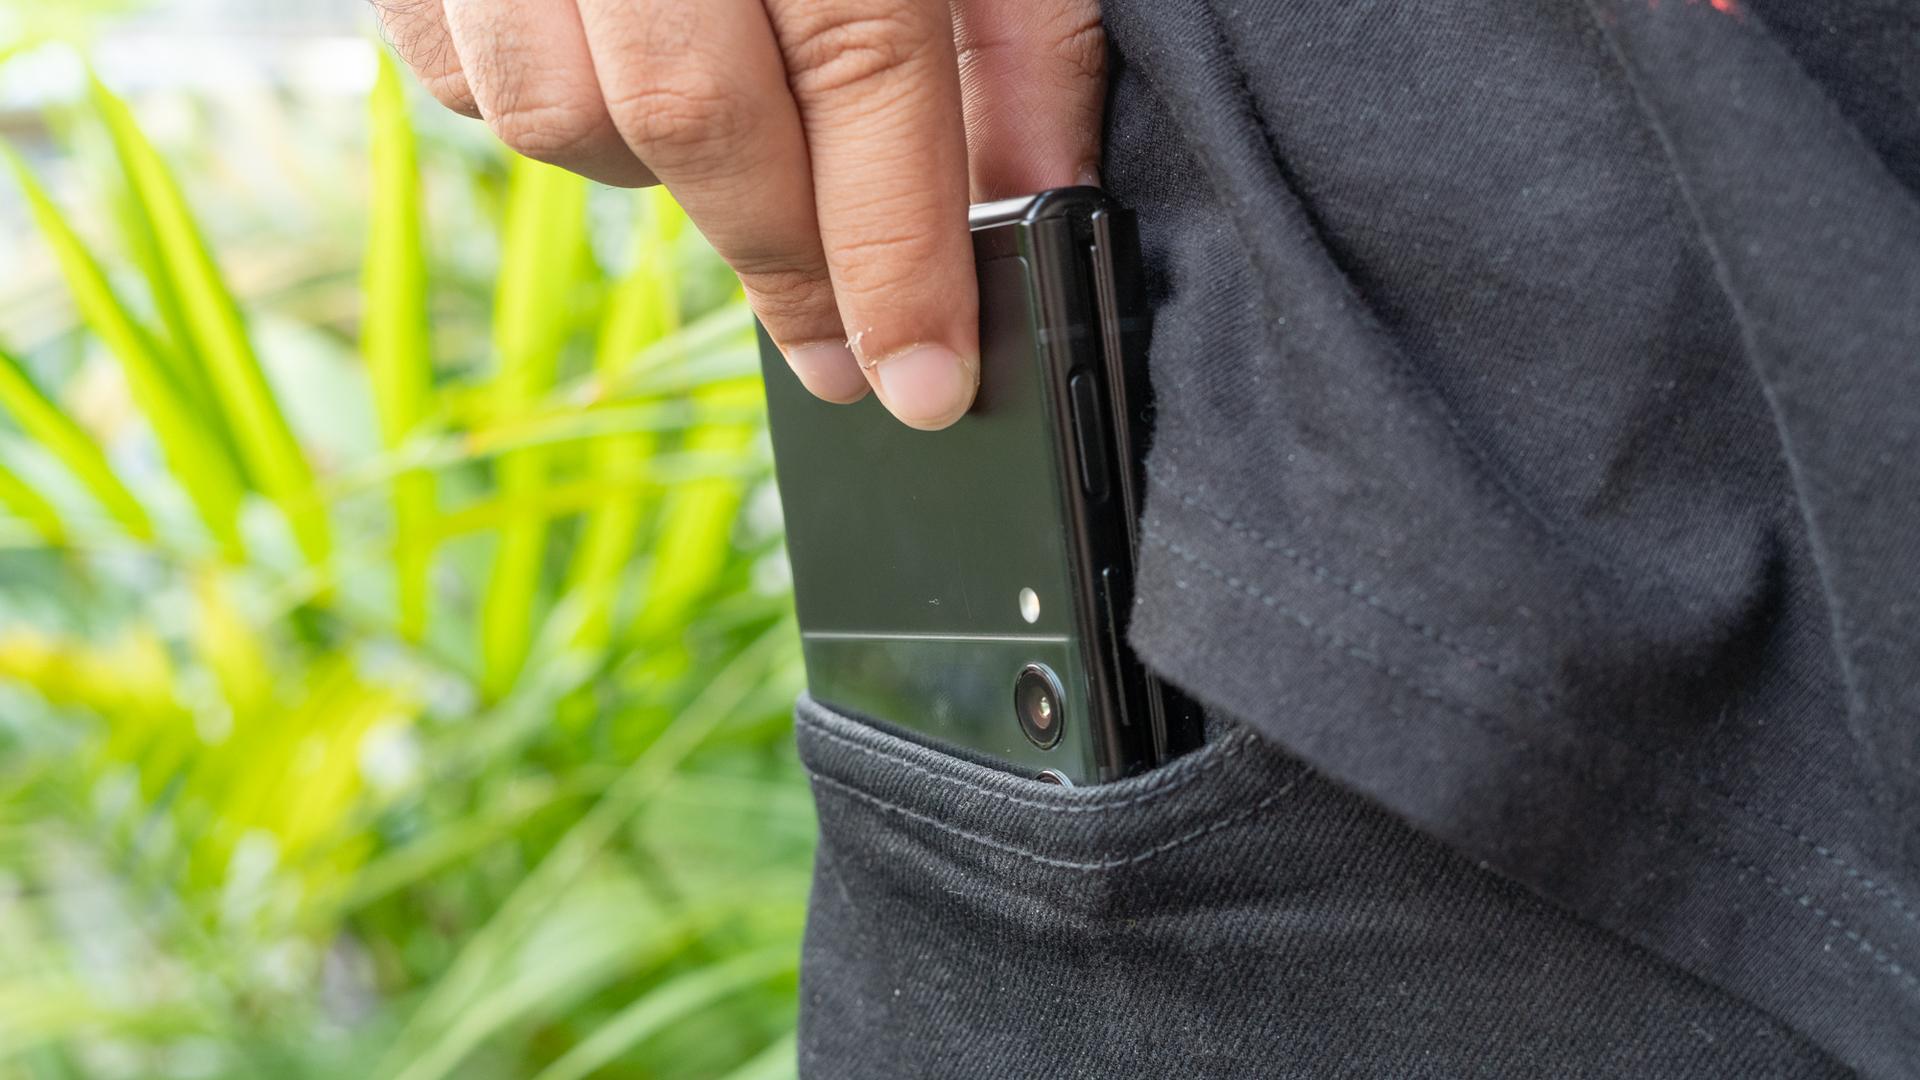 Samsung Galaxy Z Flip 3 telefone móvel no bolso